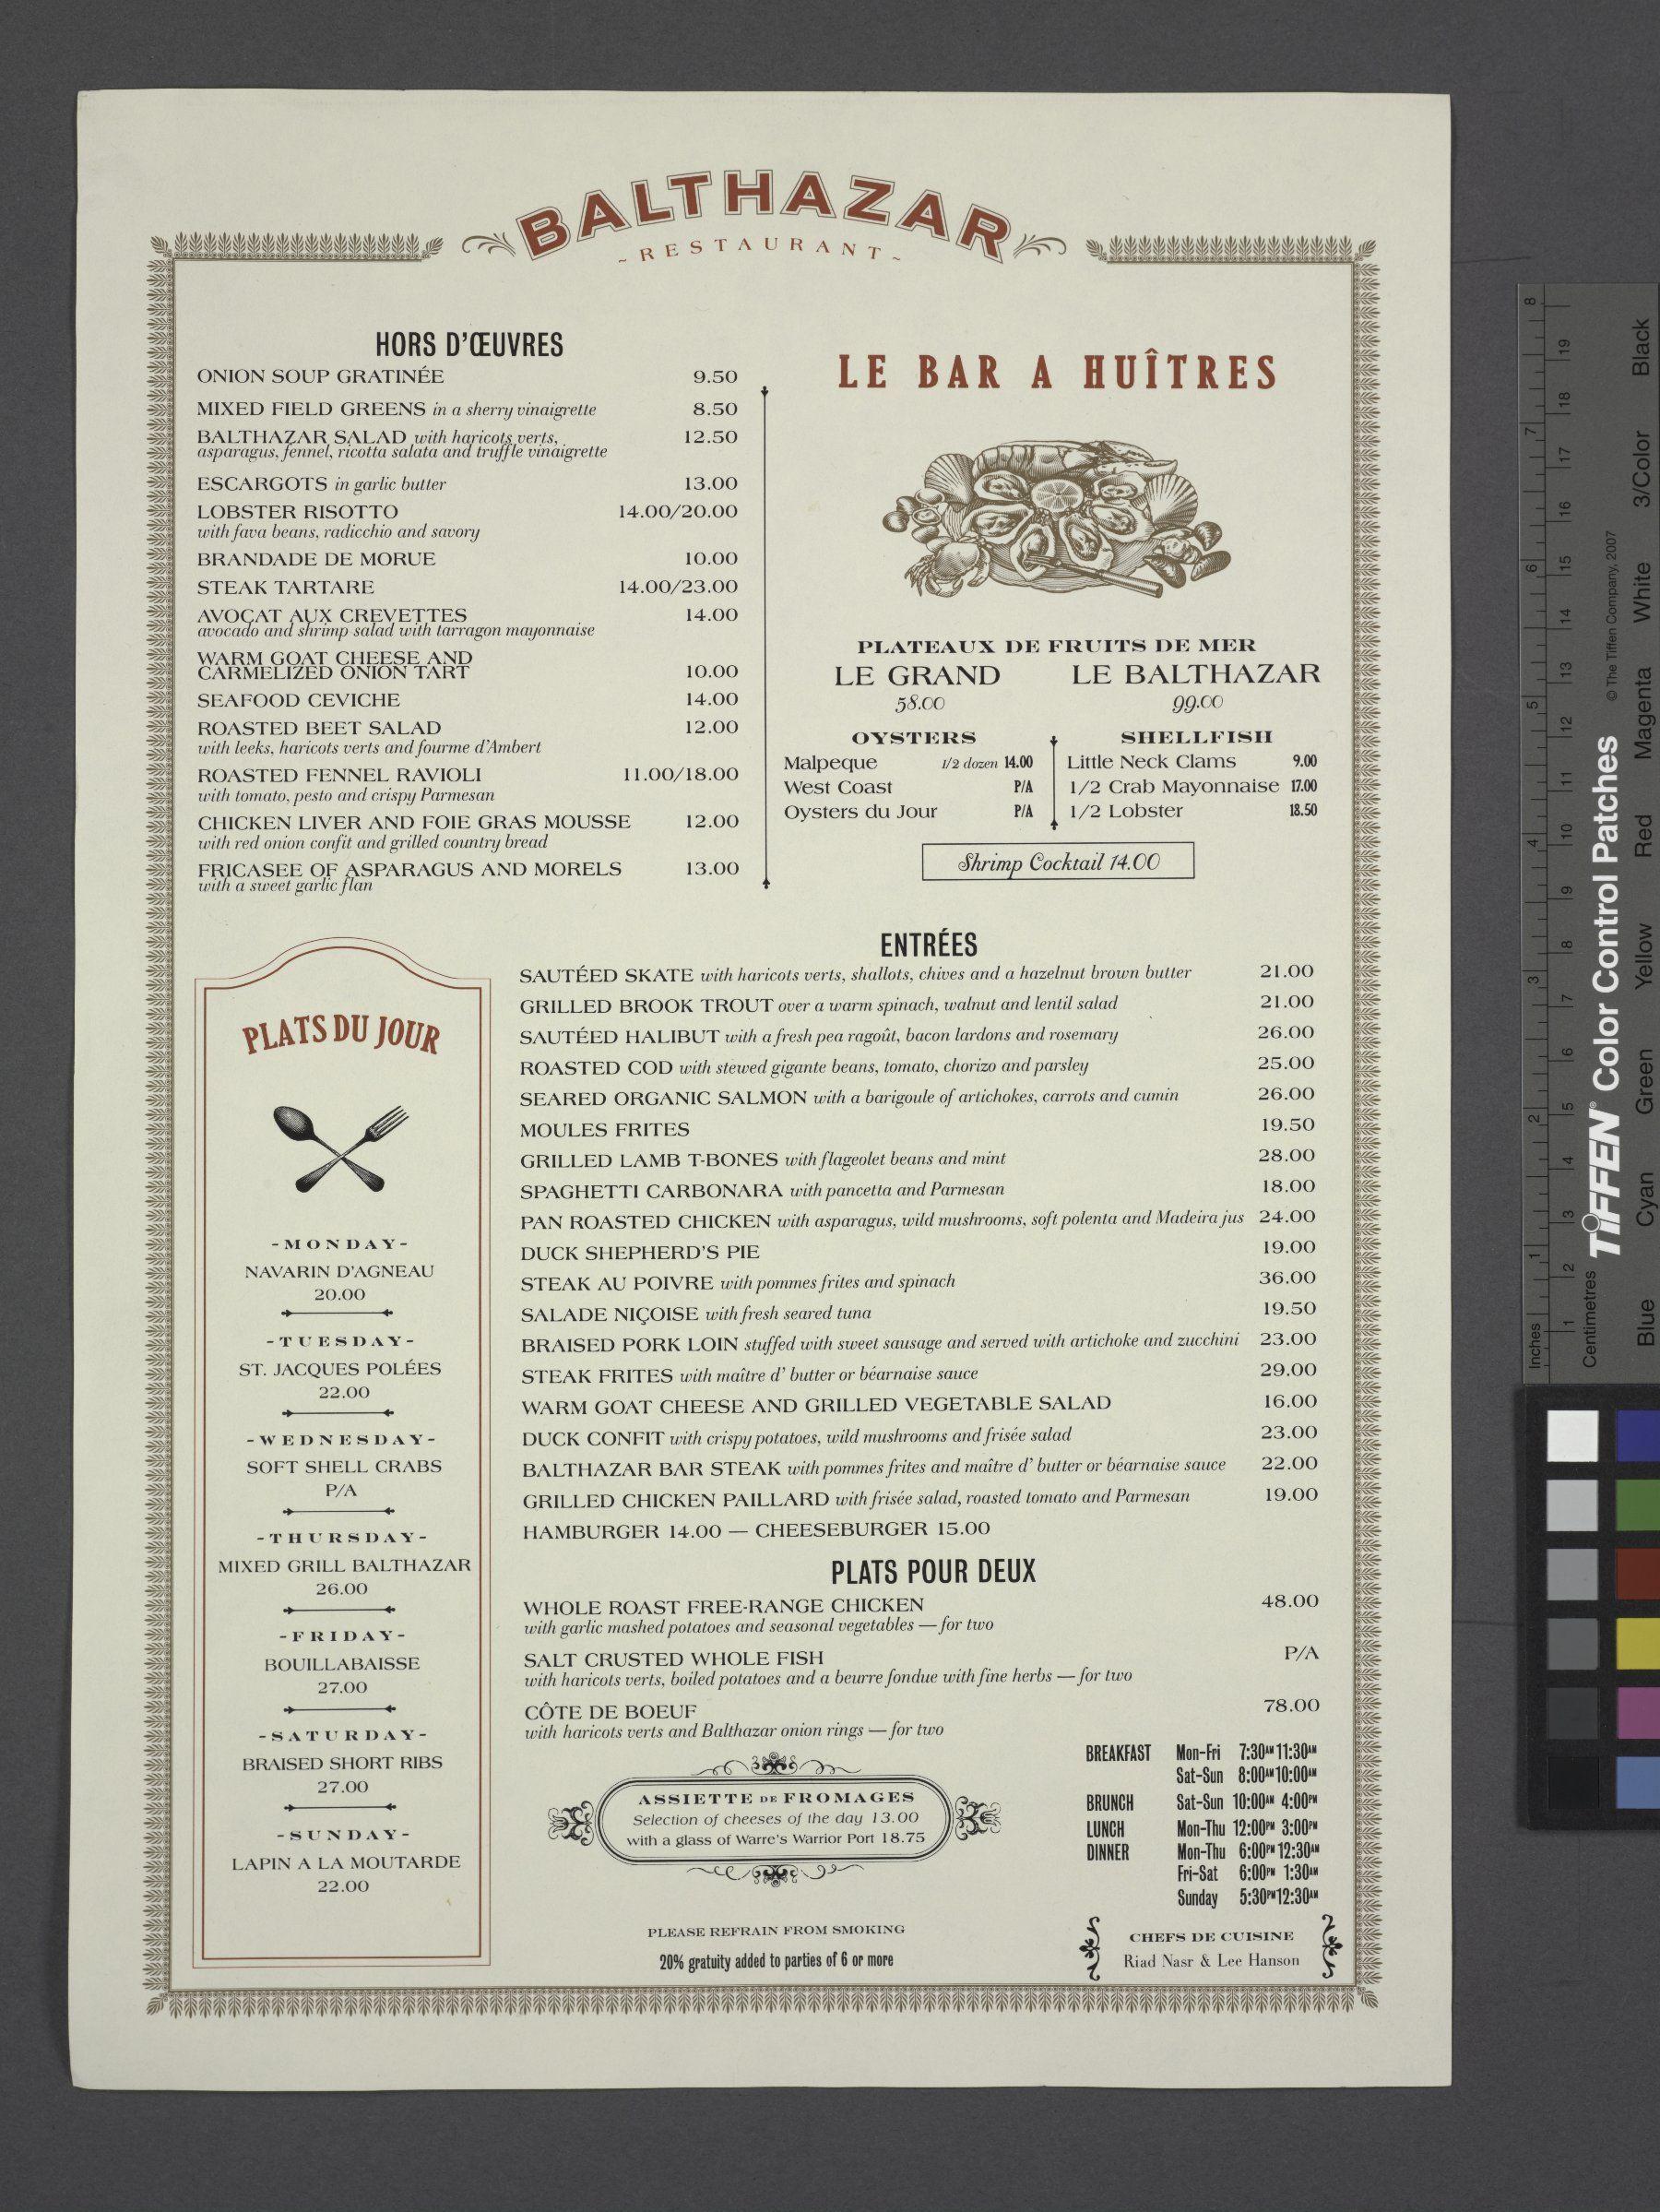 Balthazar Restaurant Menu | Food in History | Menu design